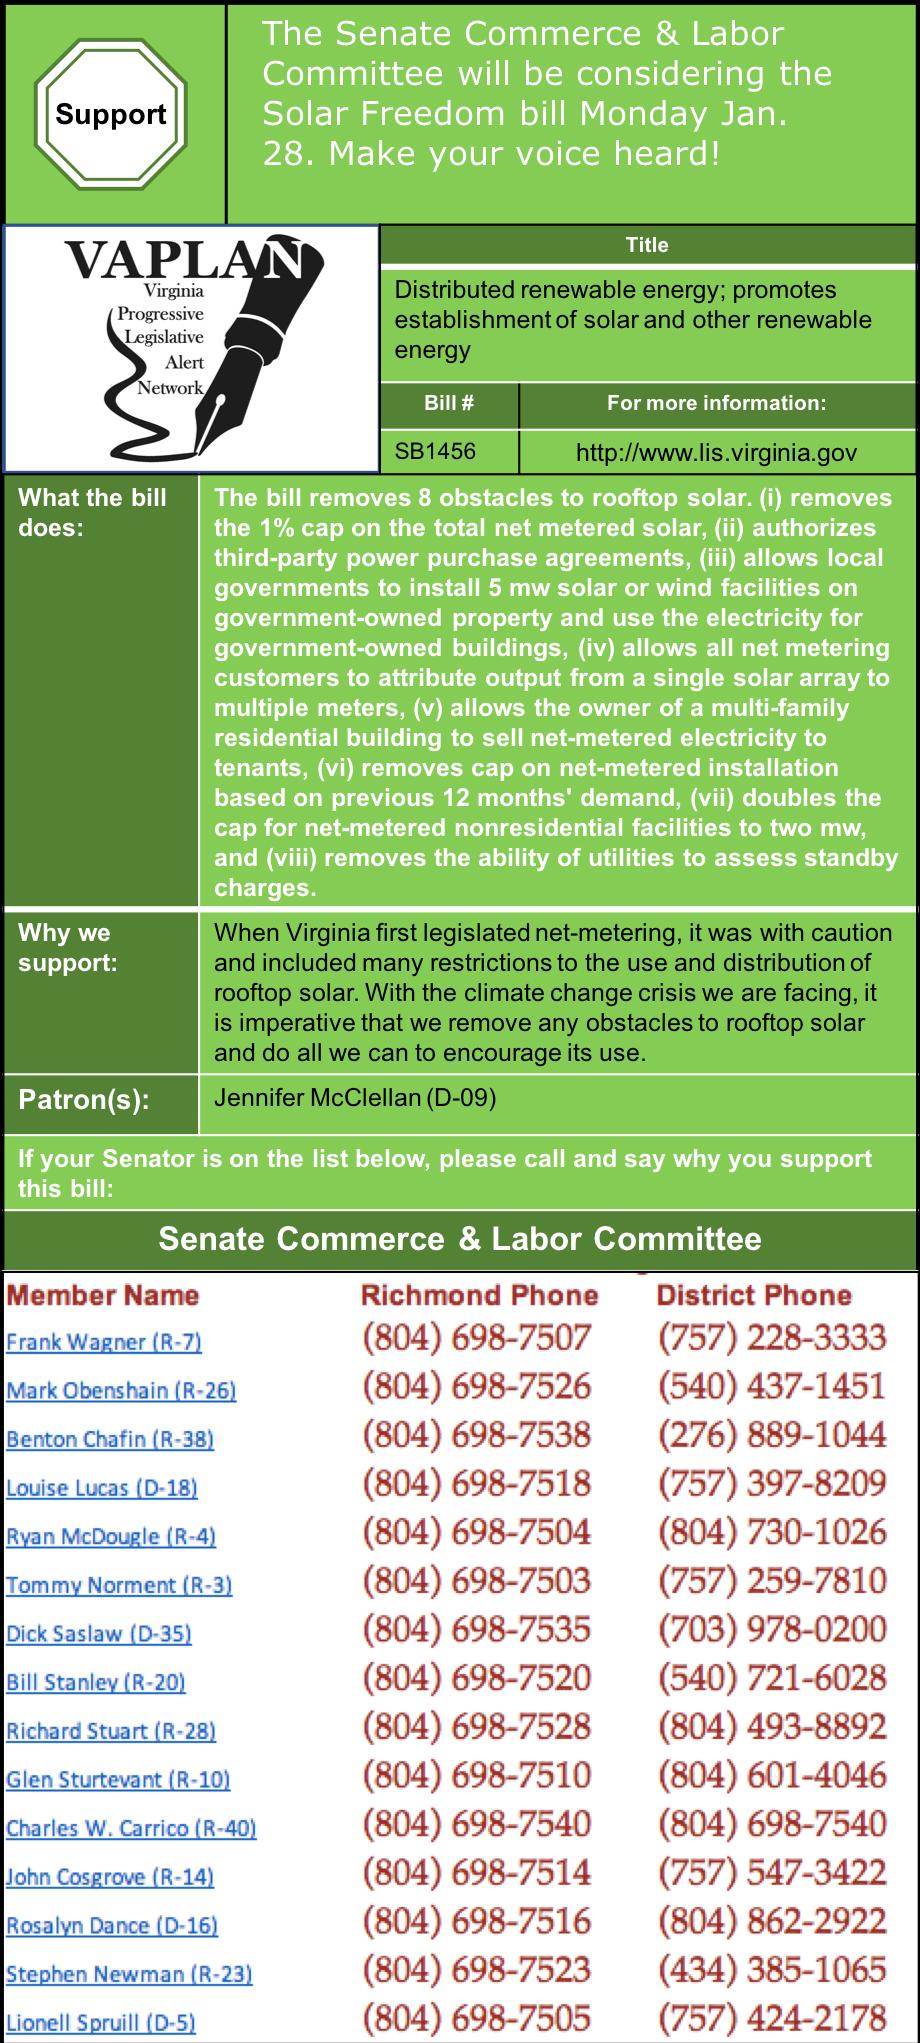 ALERT: Senate Commerce & Labor to consider Solar Freedom bill, Monday Jan. 28.